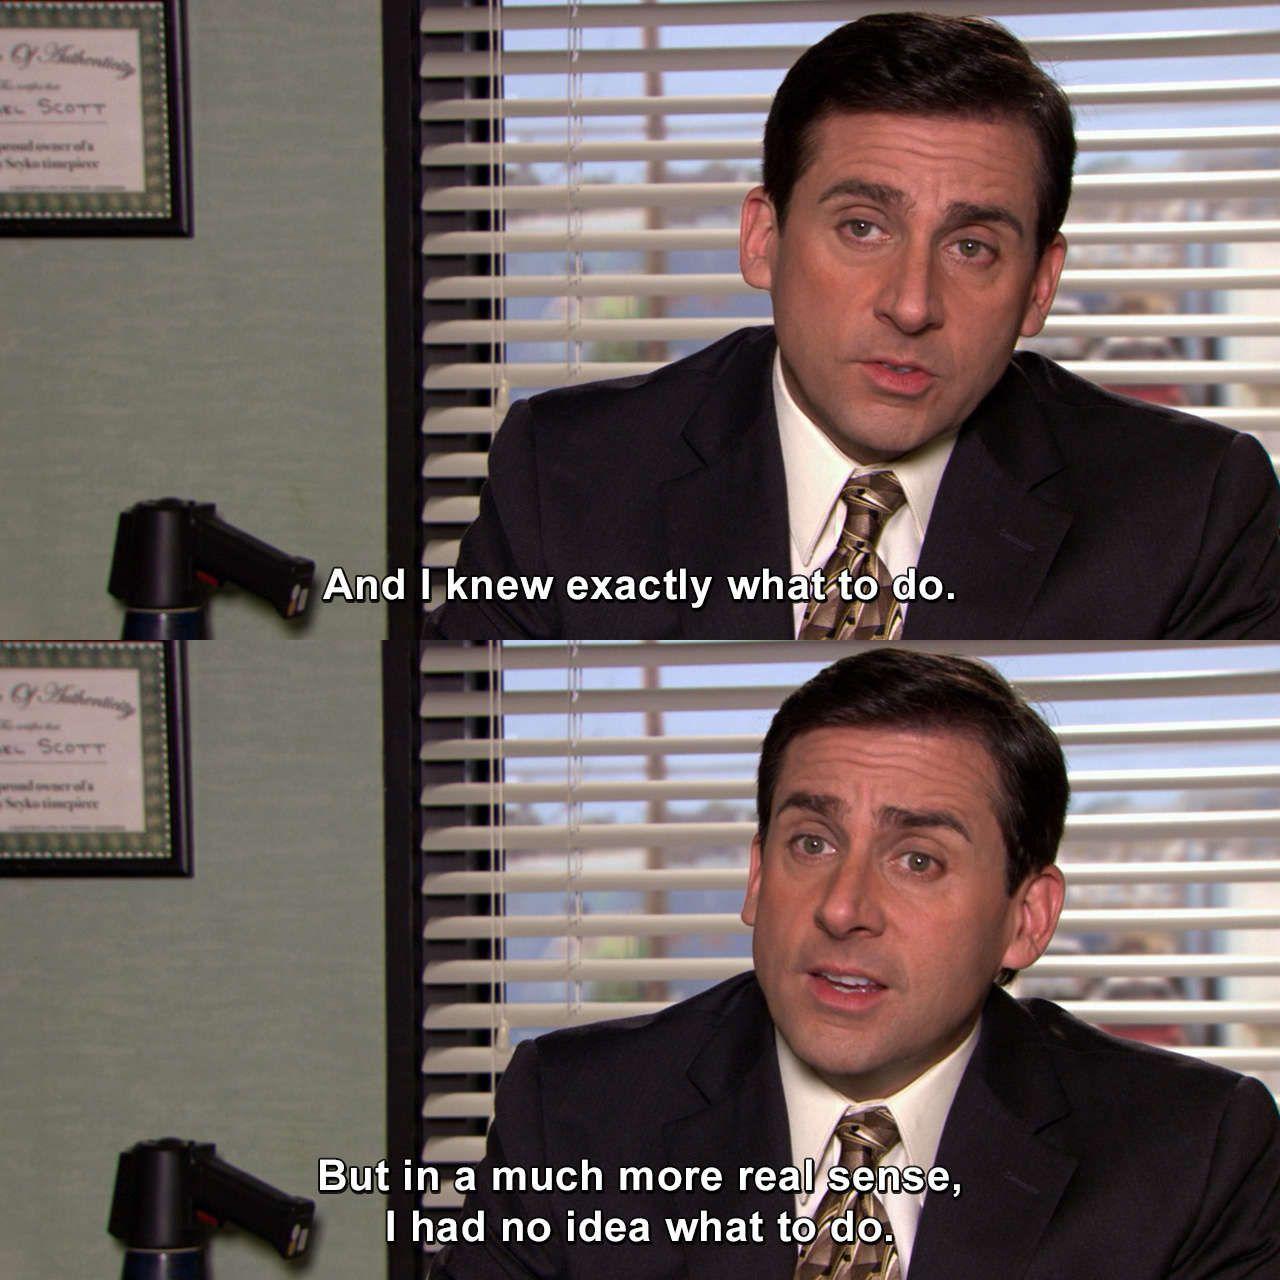 The Office Stress Relief Michaelscott Theoffice Stressrelief Funny Meme Office Quotes Michael Scott Quotes Office Quotes Funny